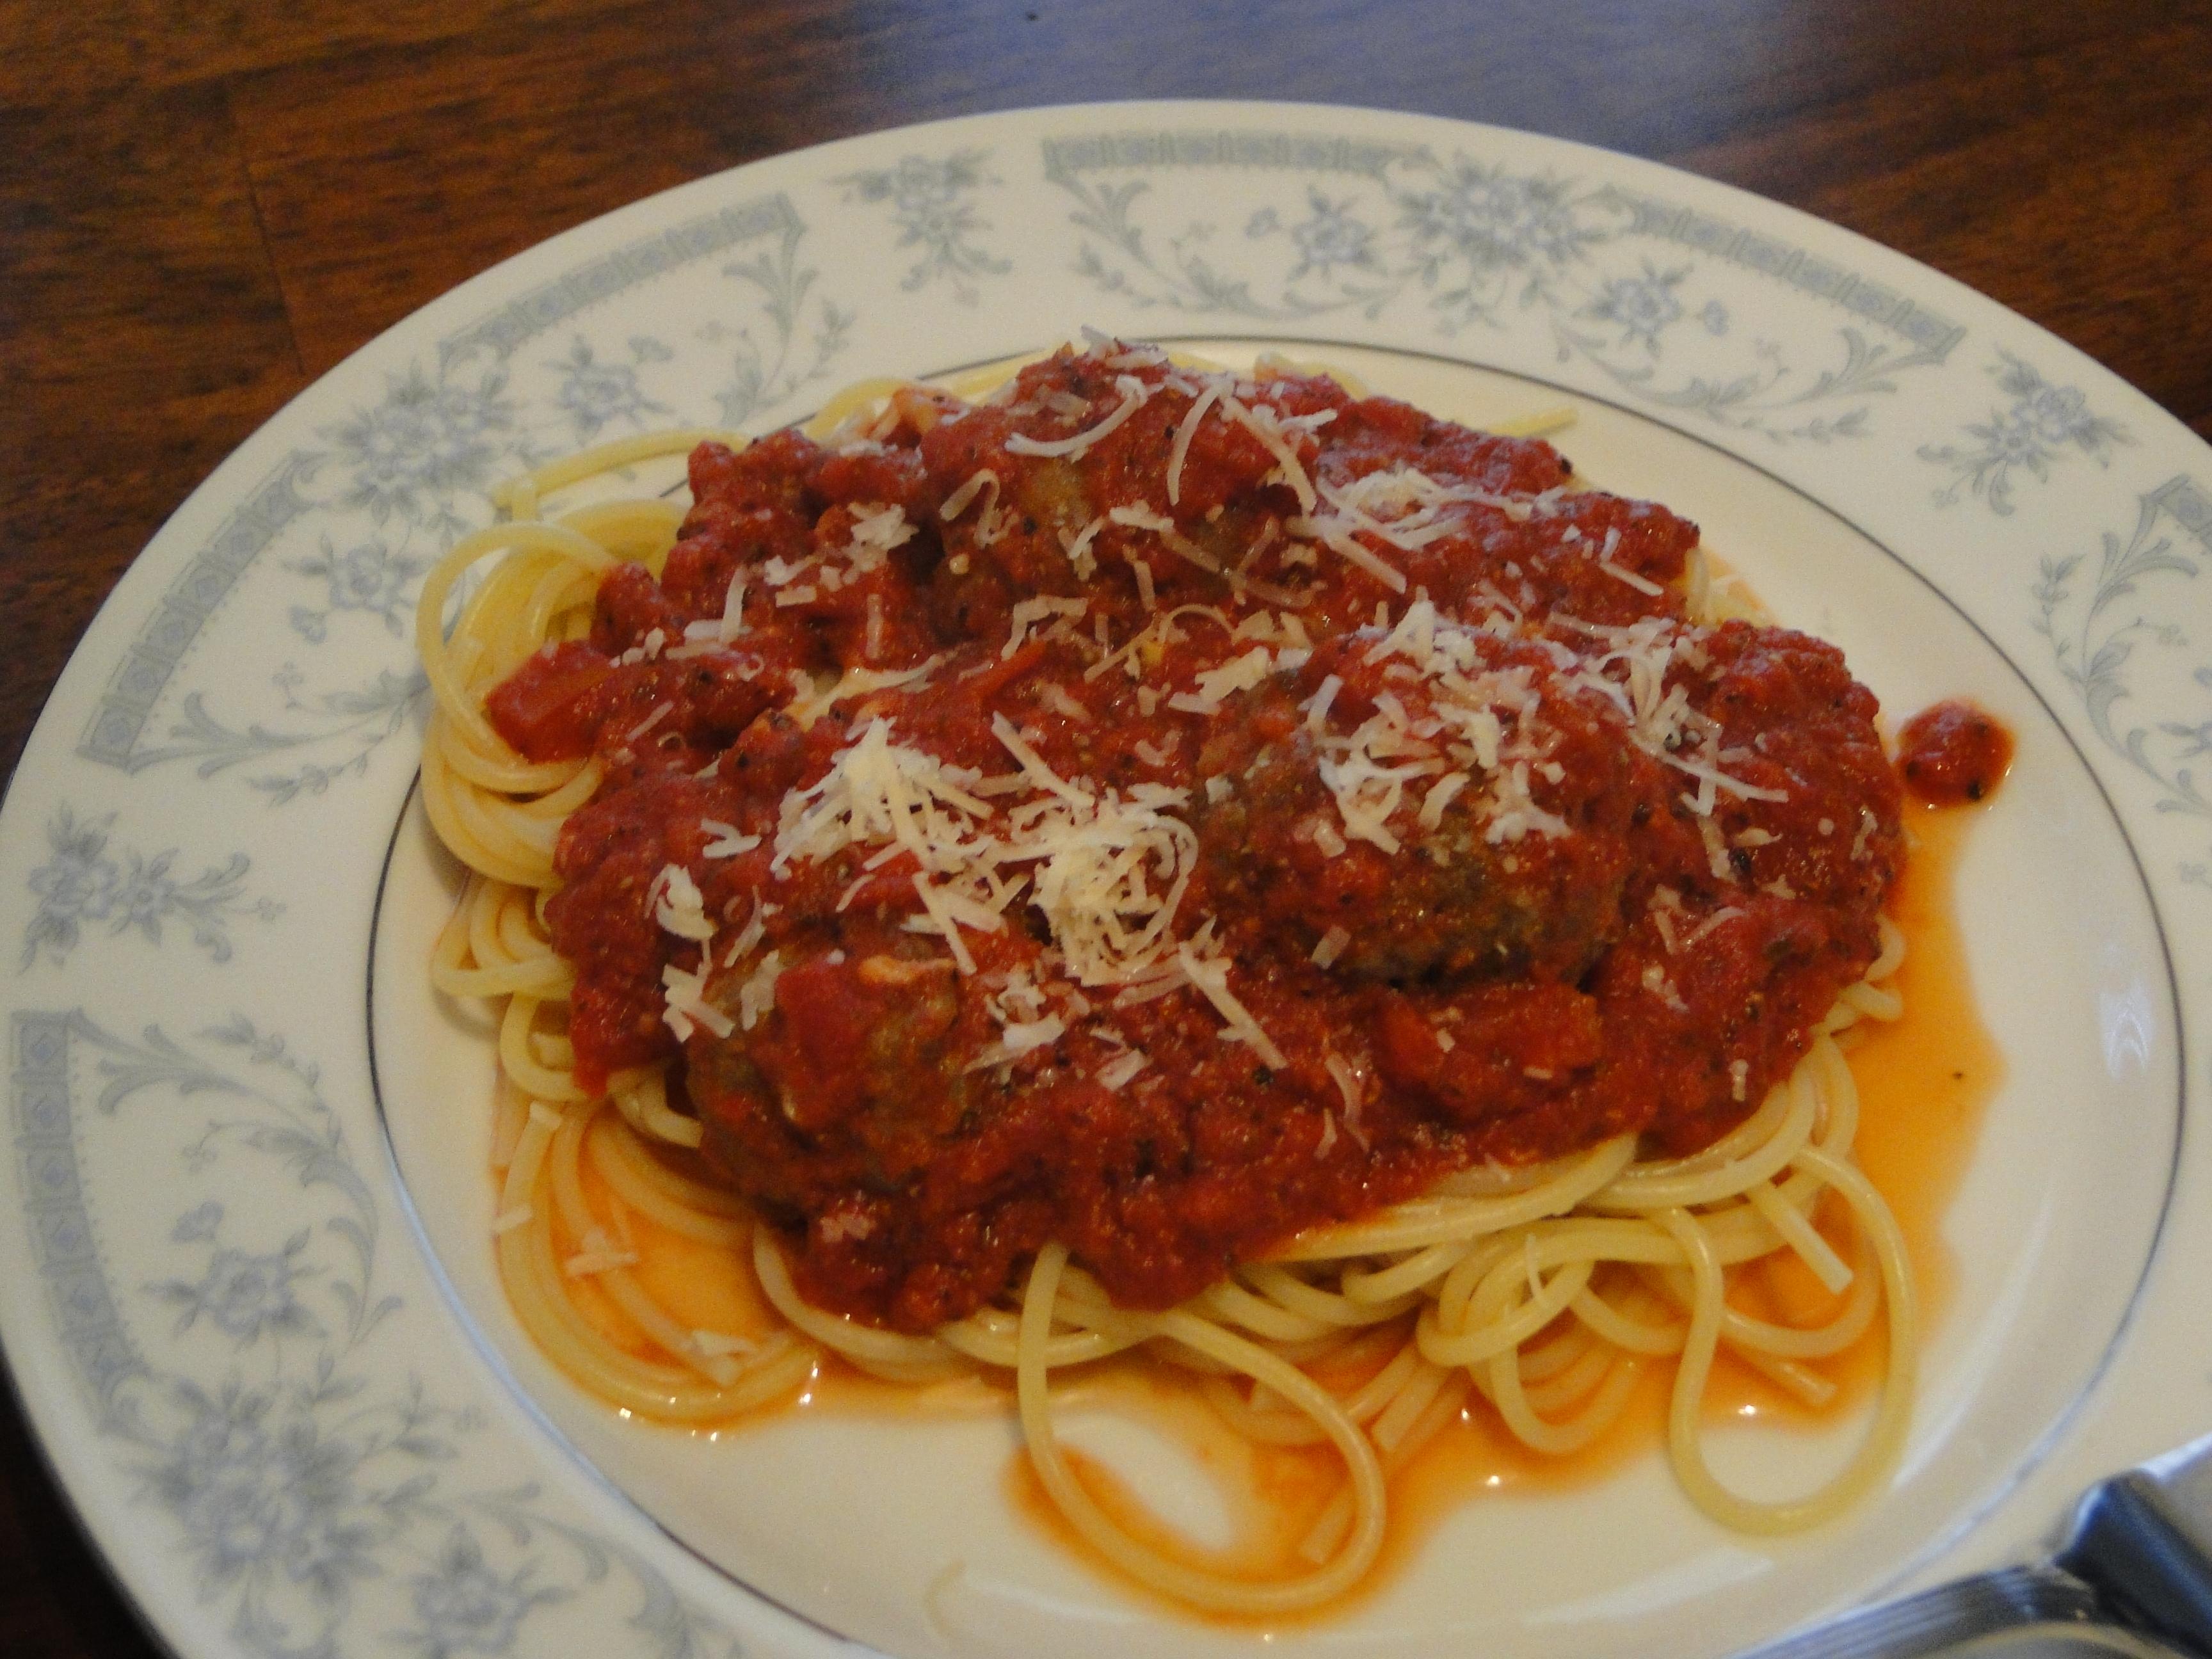 Homemade Spaghetti Sauce A Joyful Servant